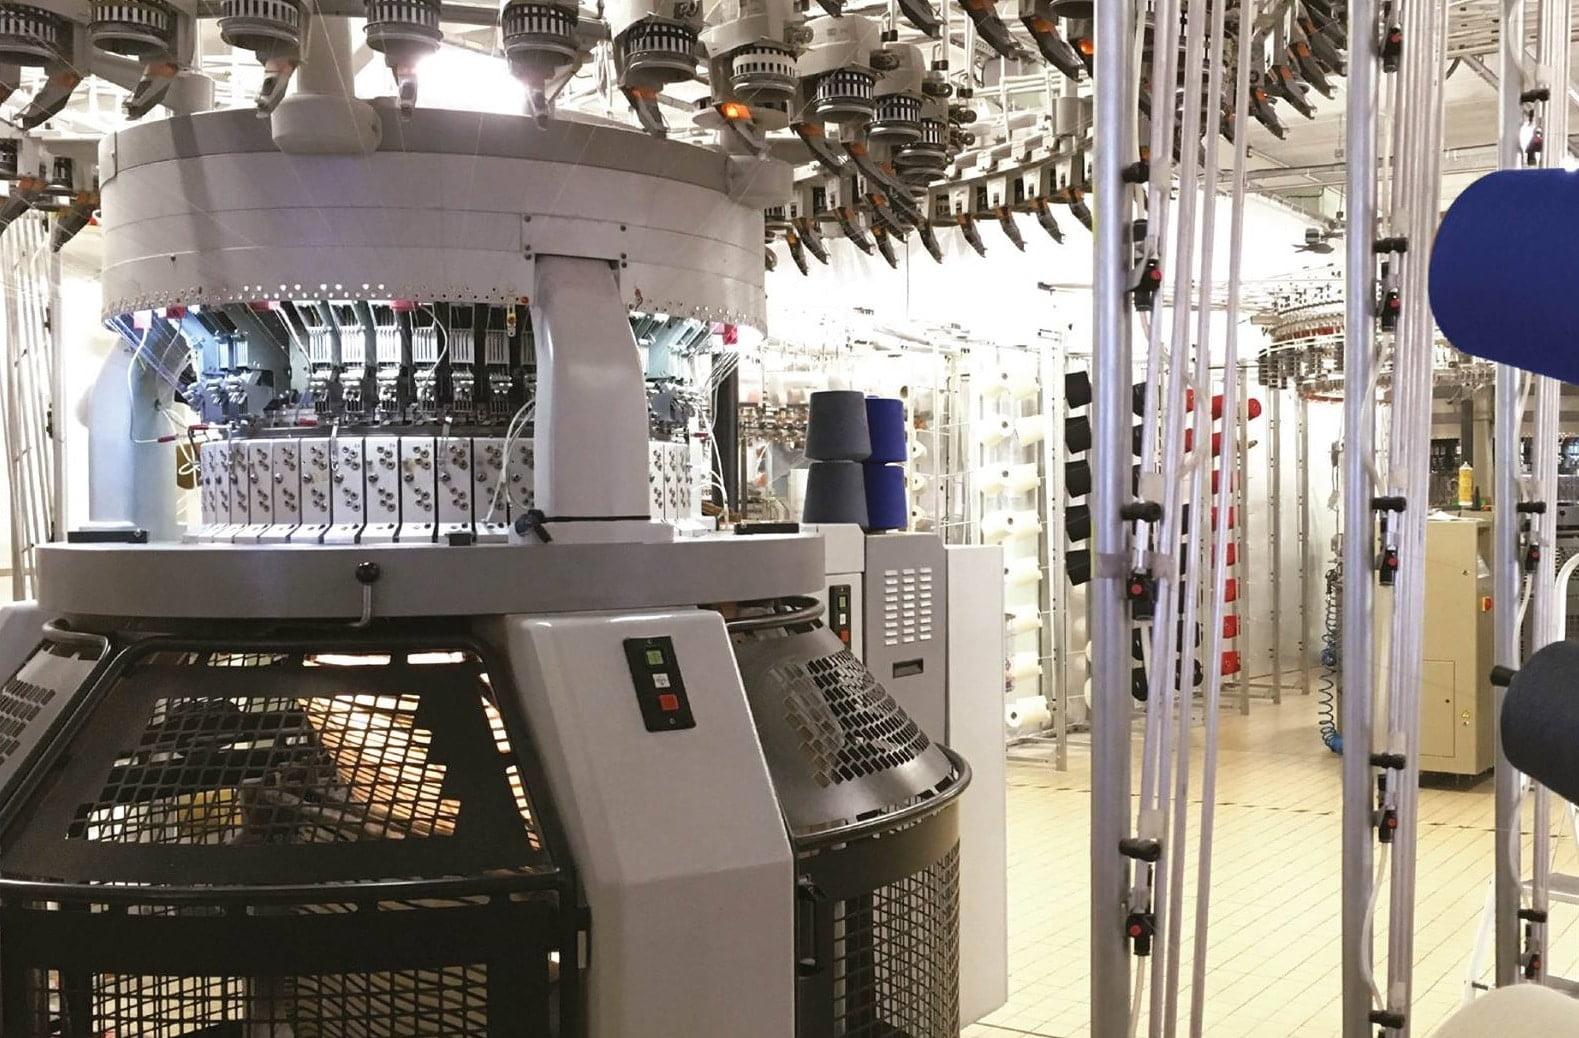 https://www.marques-de-france.fr/wp-content/uploads/2019/03/Armor-Lux_usine3.jpg